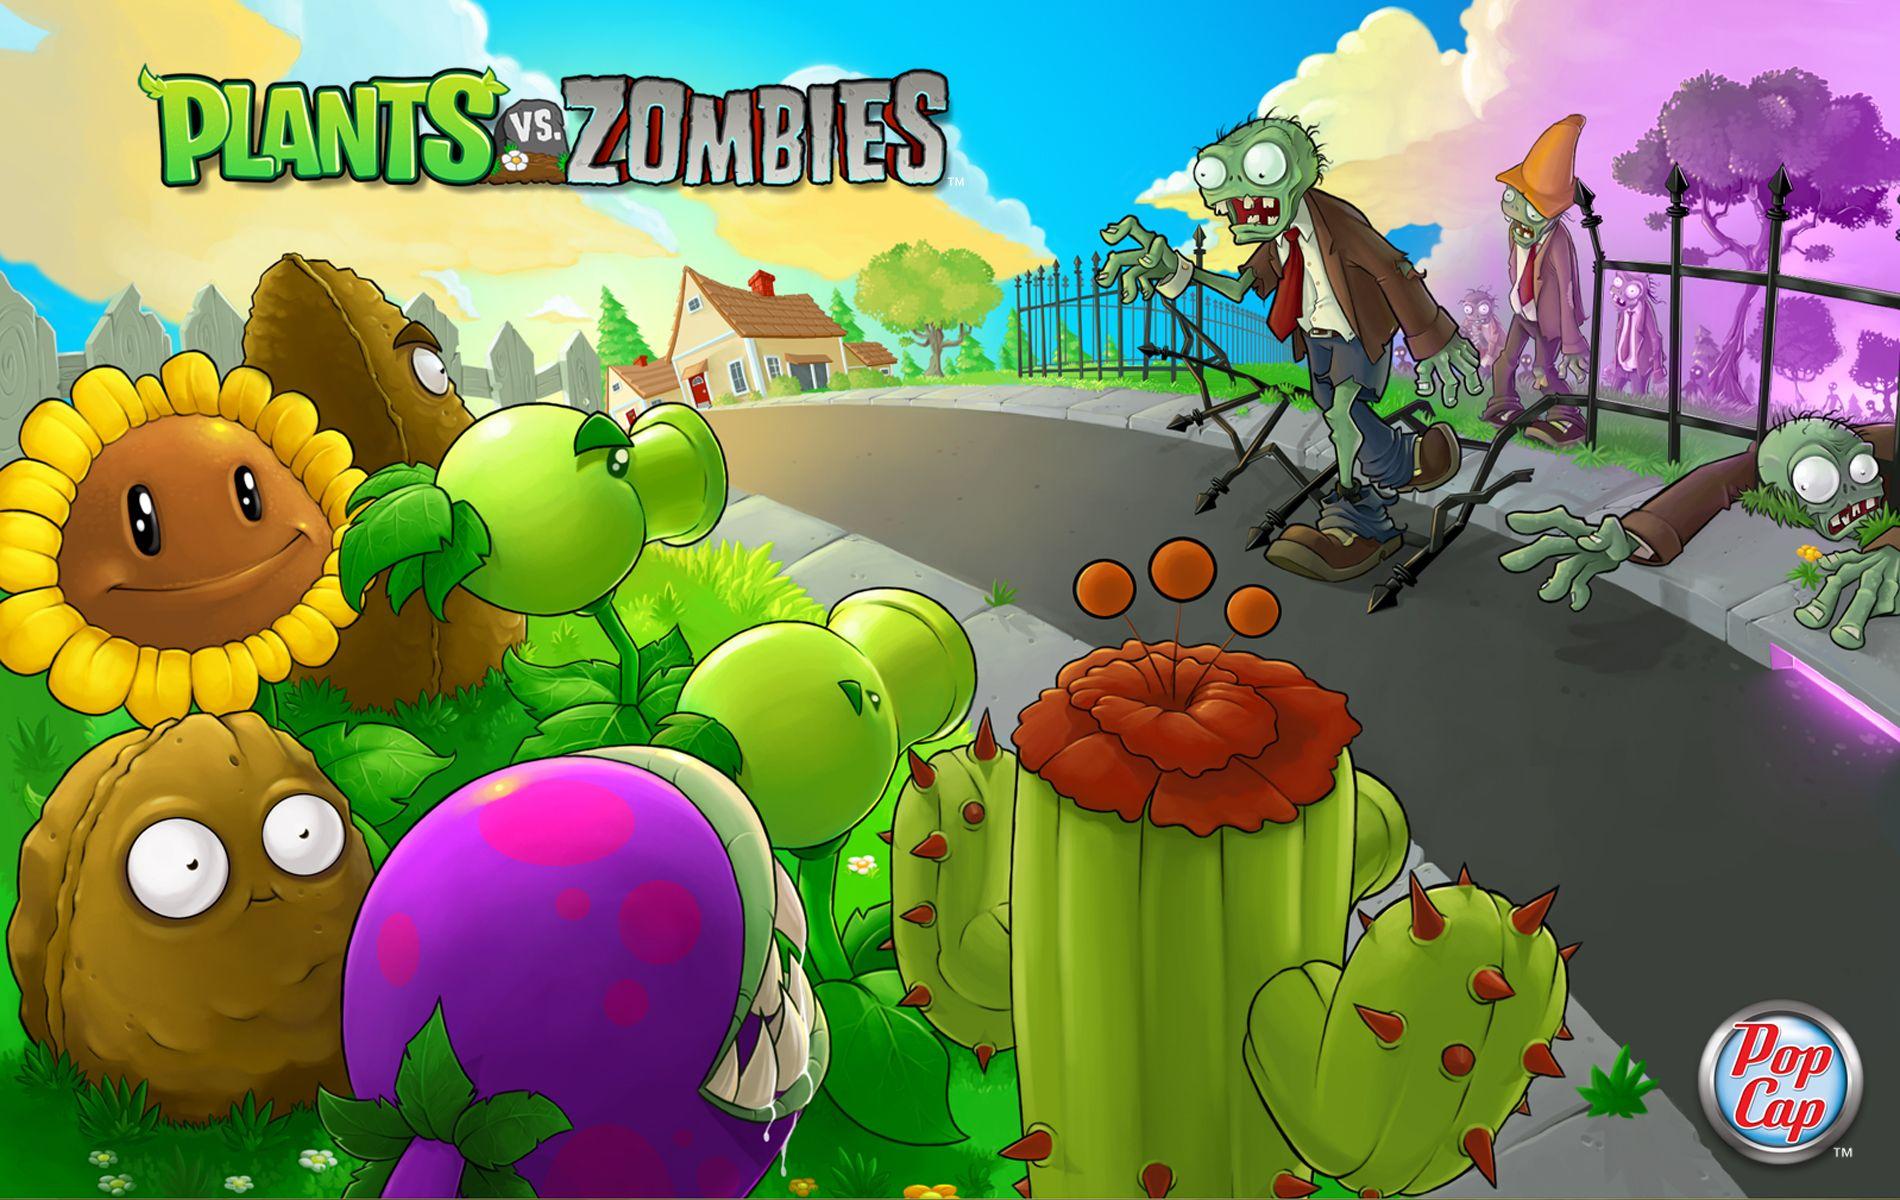 Google chrome themes zombie - Google Image Result For Http Images5 Fanpop Com Image Photos 29000000 Plants Vs Zombies Wallpaper Plants Vs Zombies 29019425 1900 1200 Jpg Pinterest I